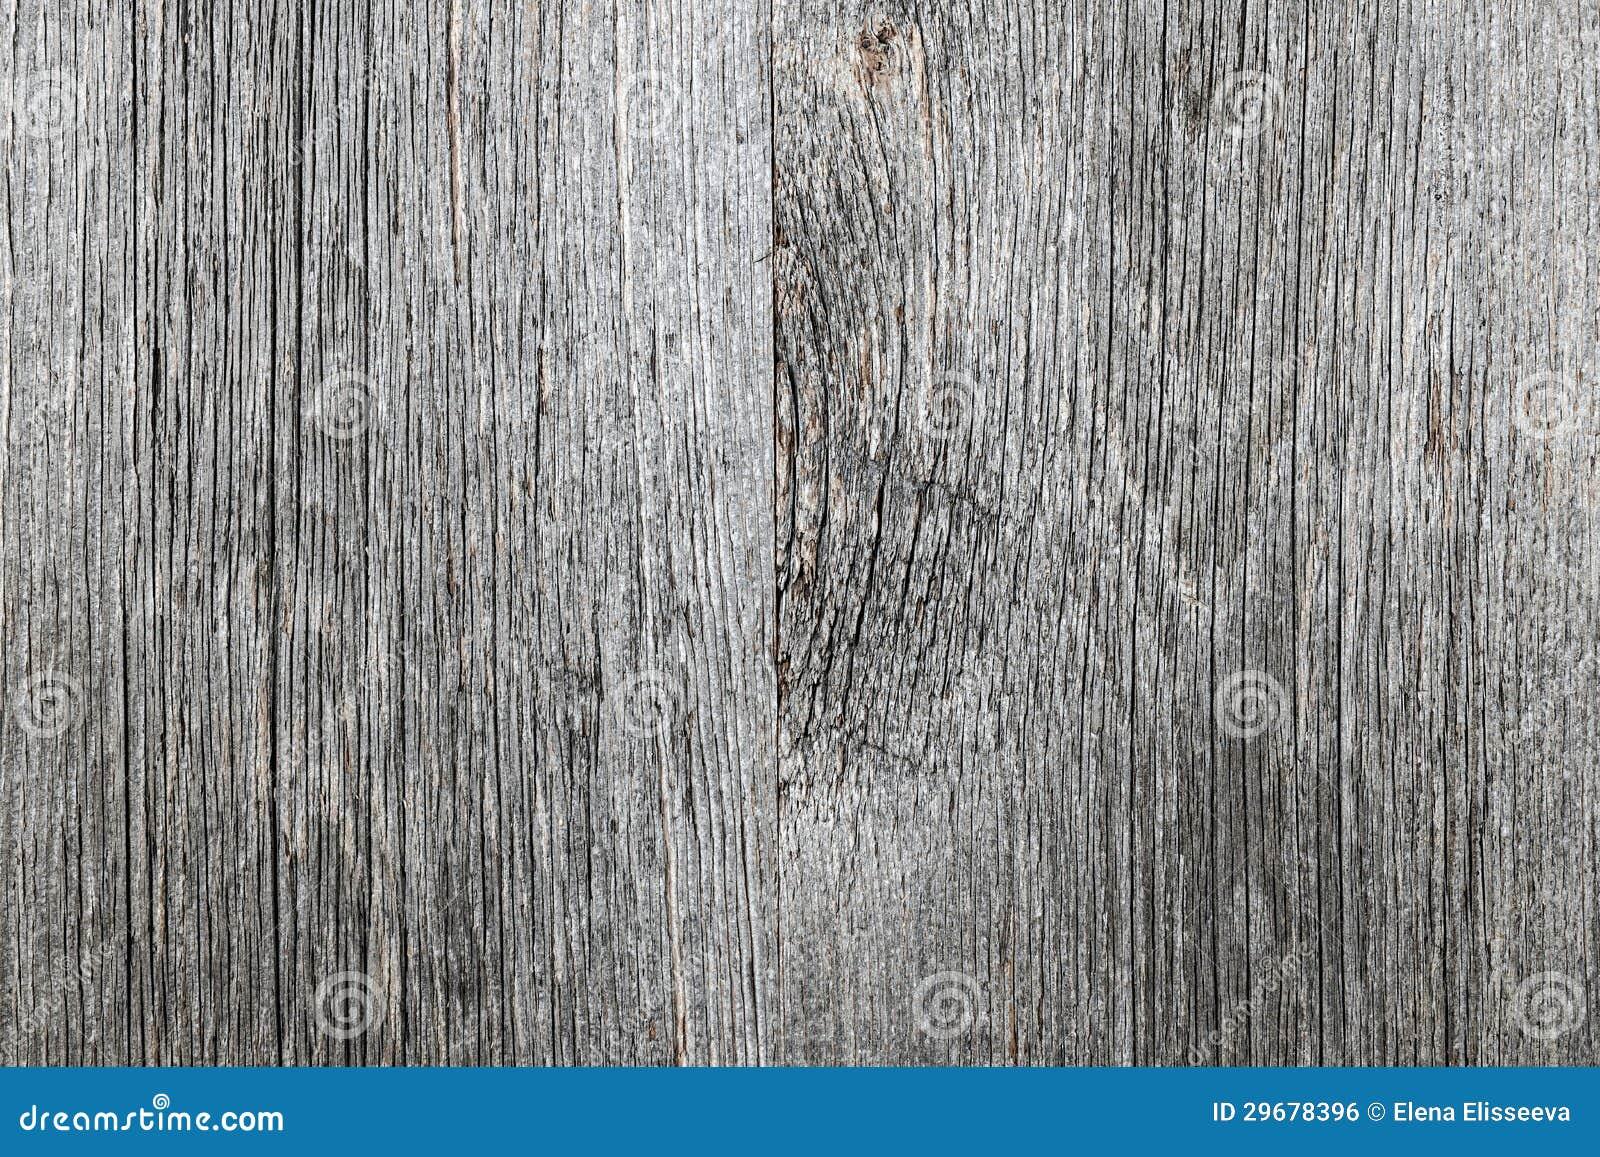 Old barn wood background stock photo image of background for Where to buy old barn wood